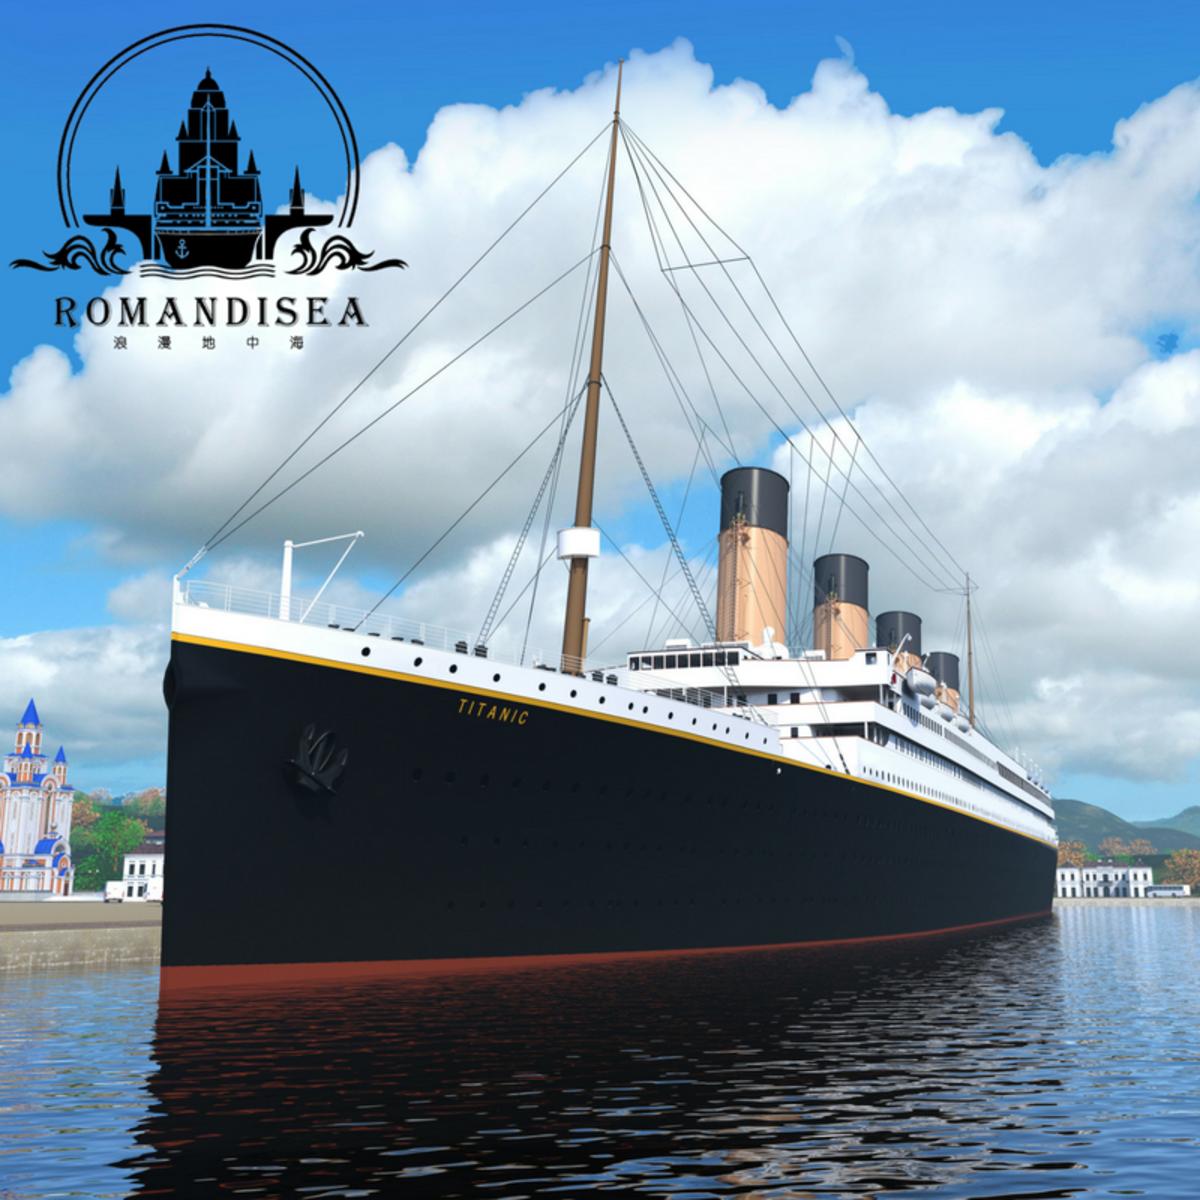 Romandisea Titanic CG rendering